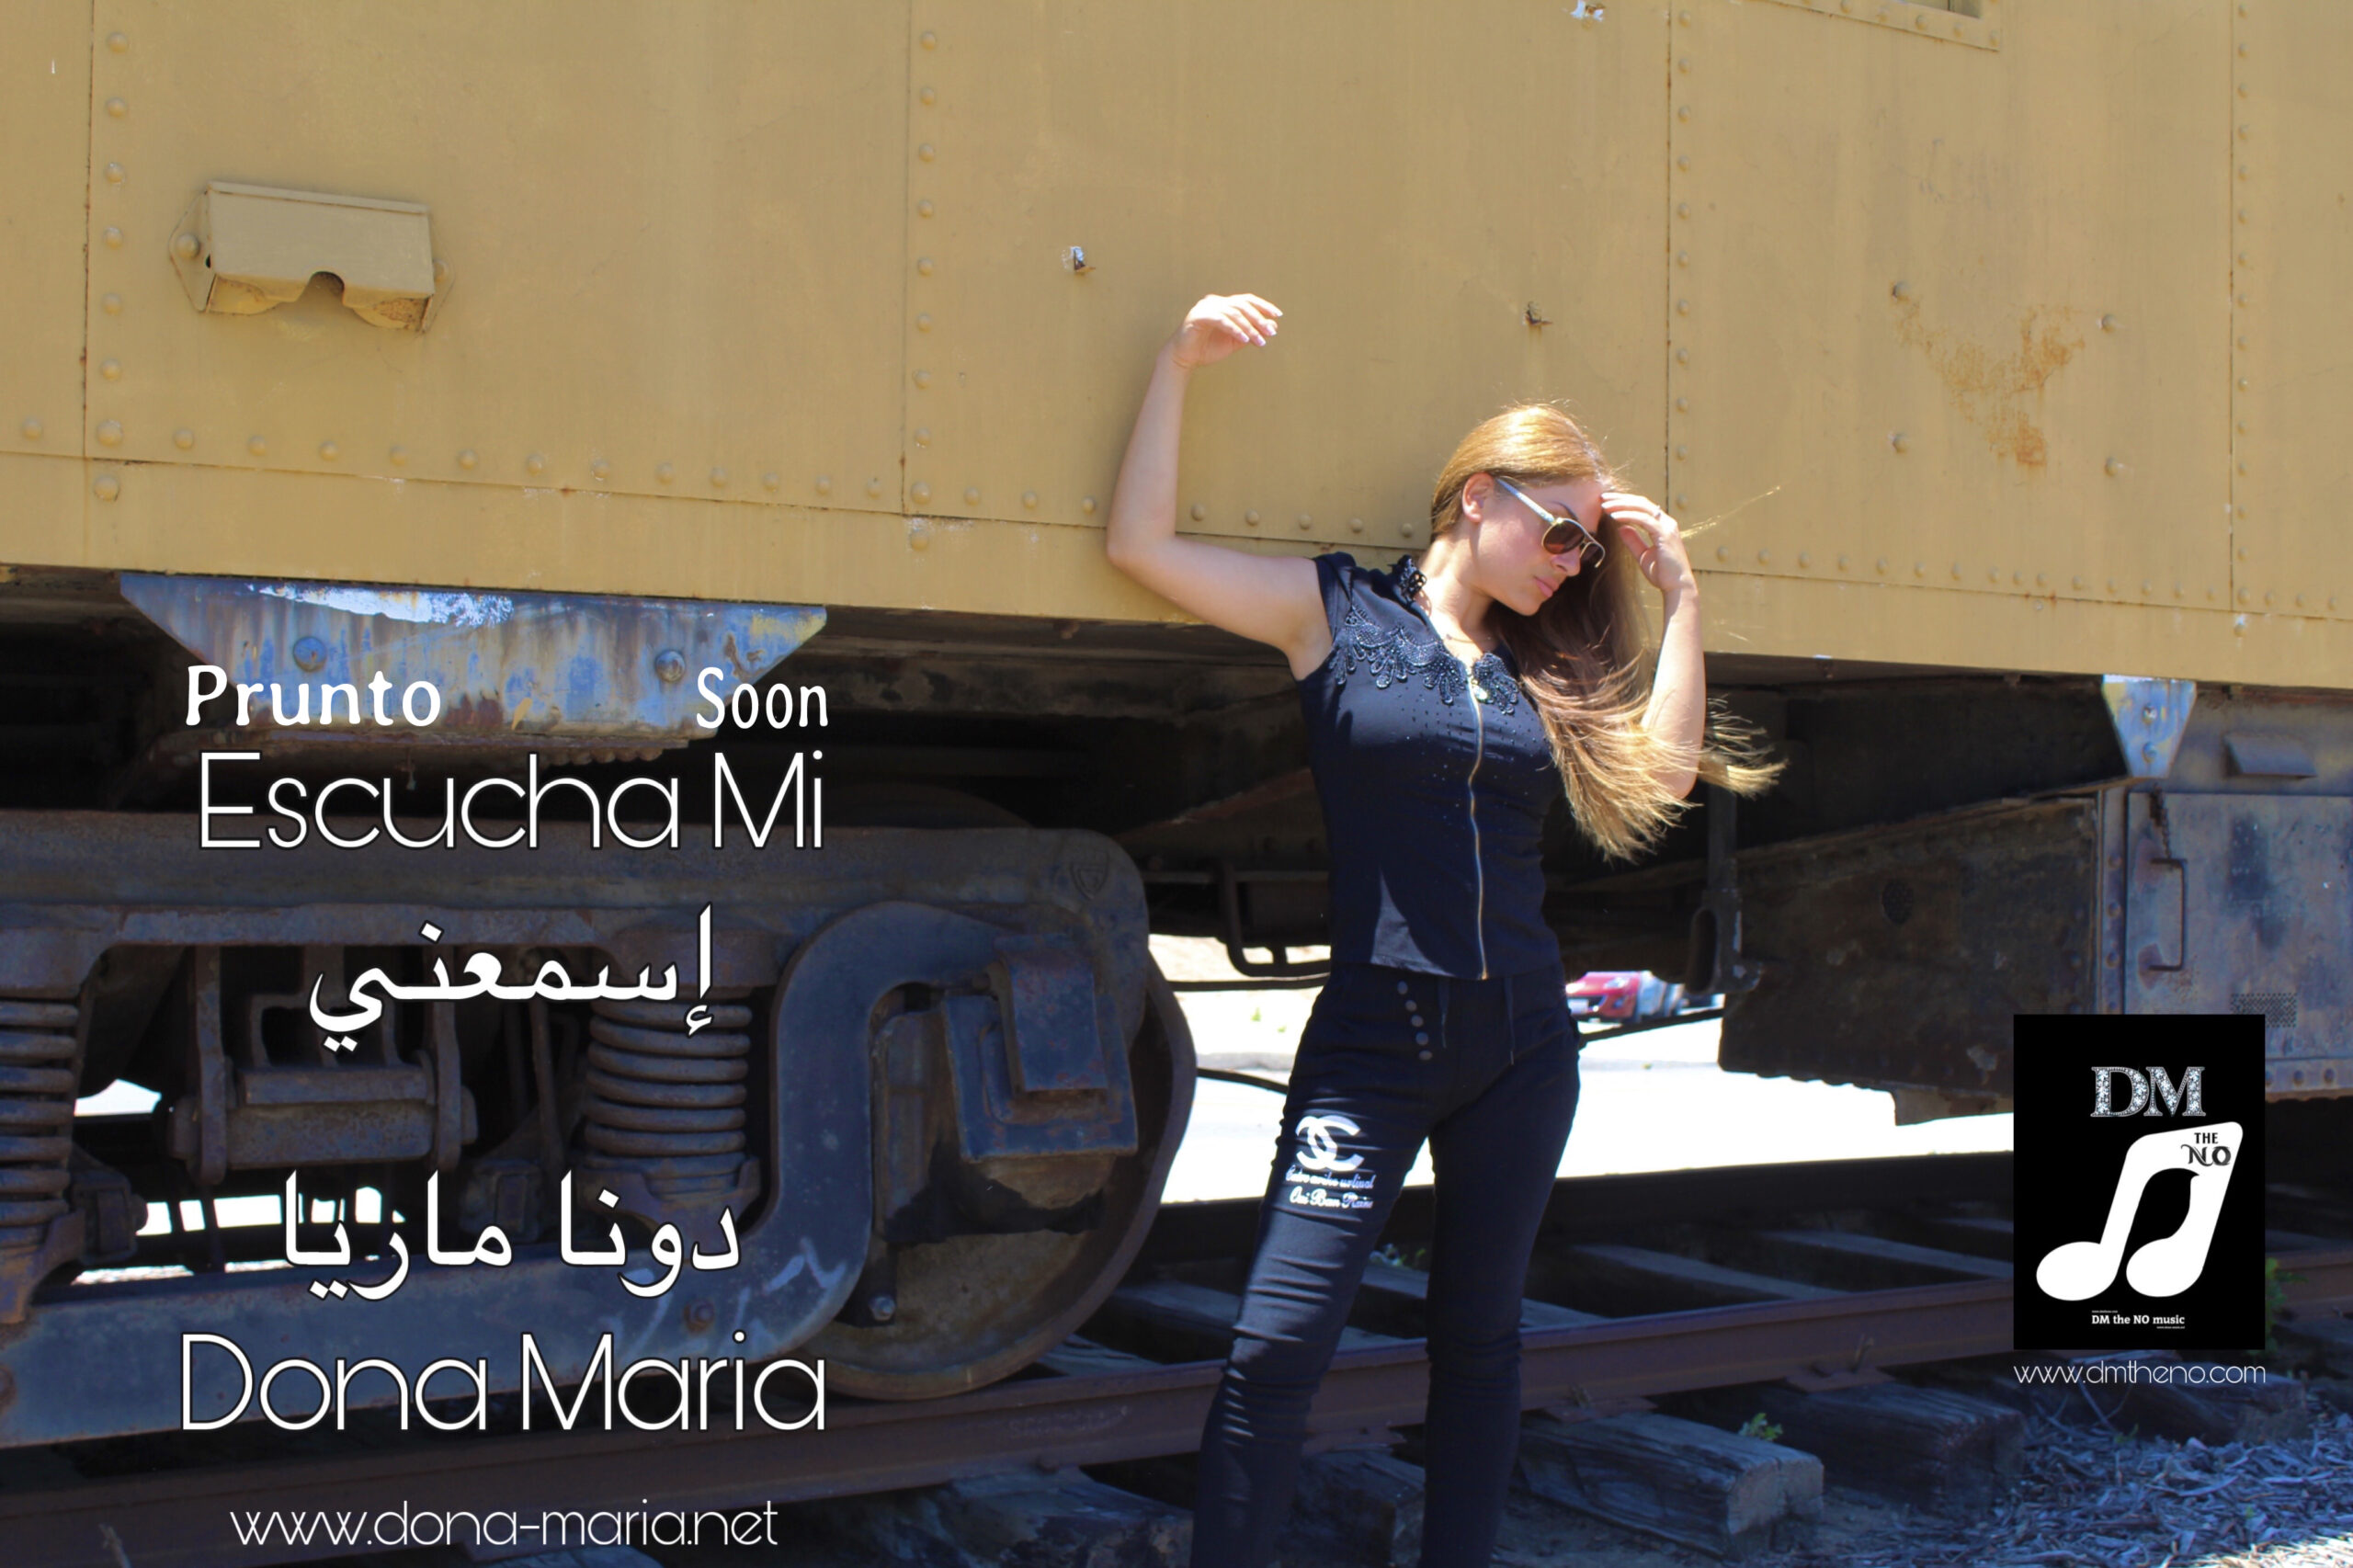 Escucha Mi - Esmaani - أسمعني - دونا ماريا - Dona Maria New Music video Soon